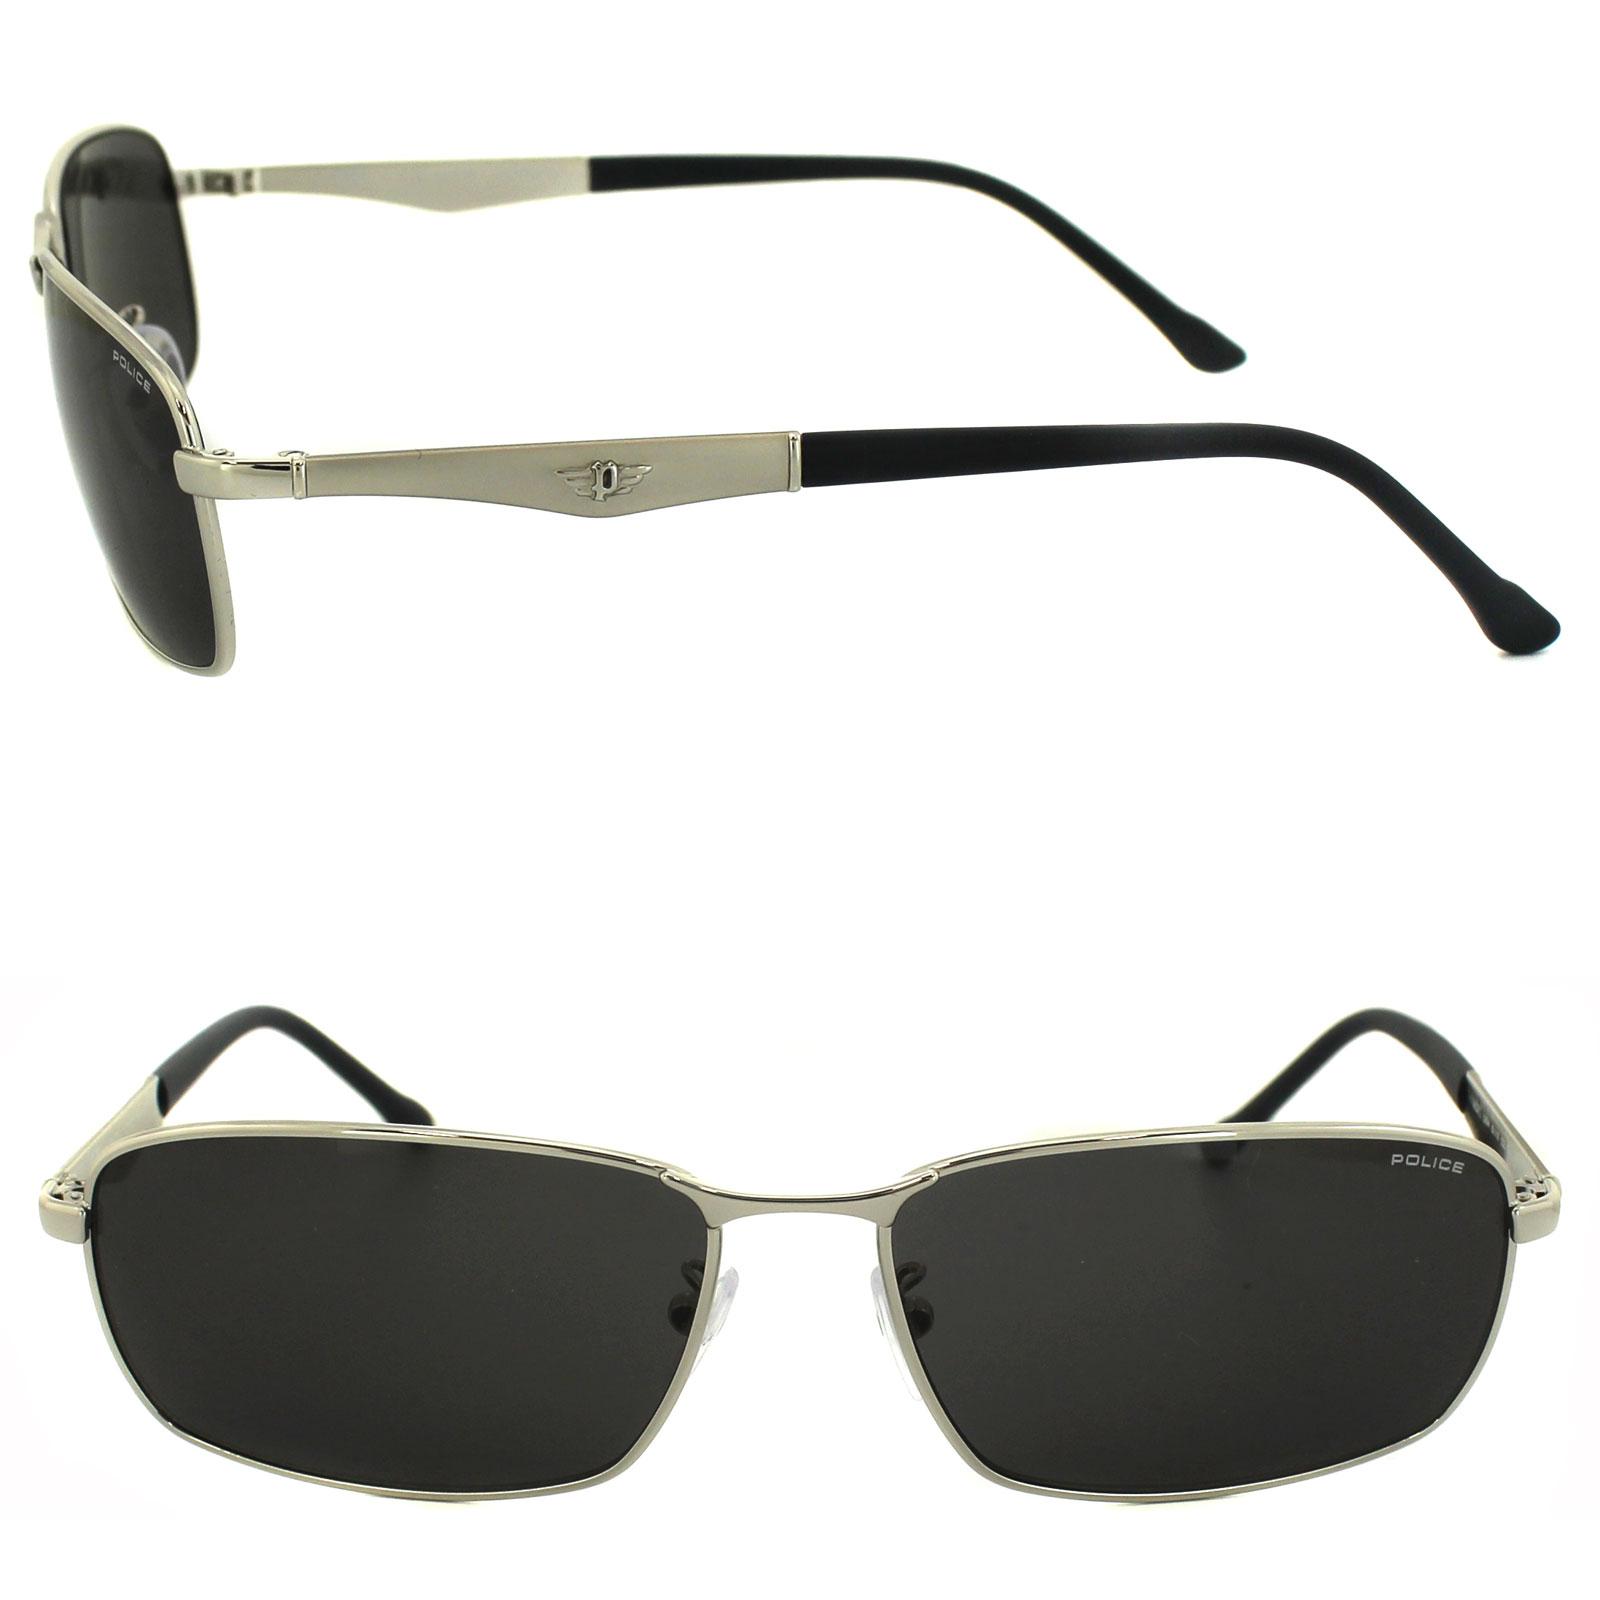 Police 8744 Sunglasses Thumbnail 1 Police 8744 Sunglasses Thumbnail 2 ...